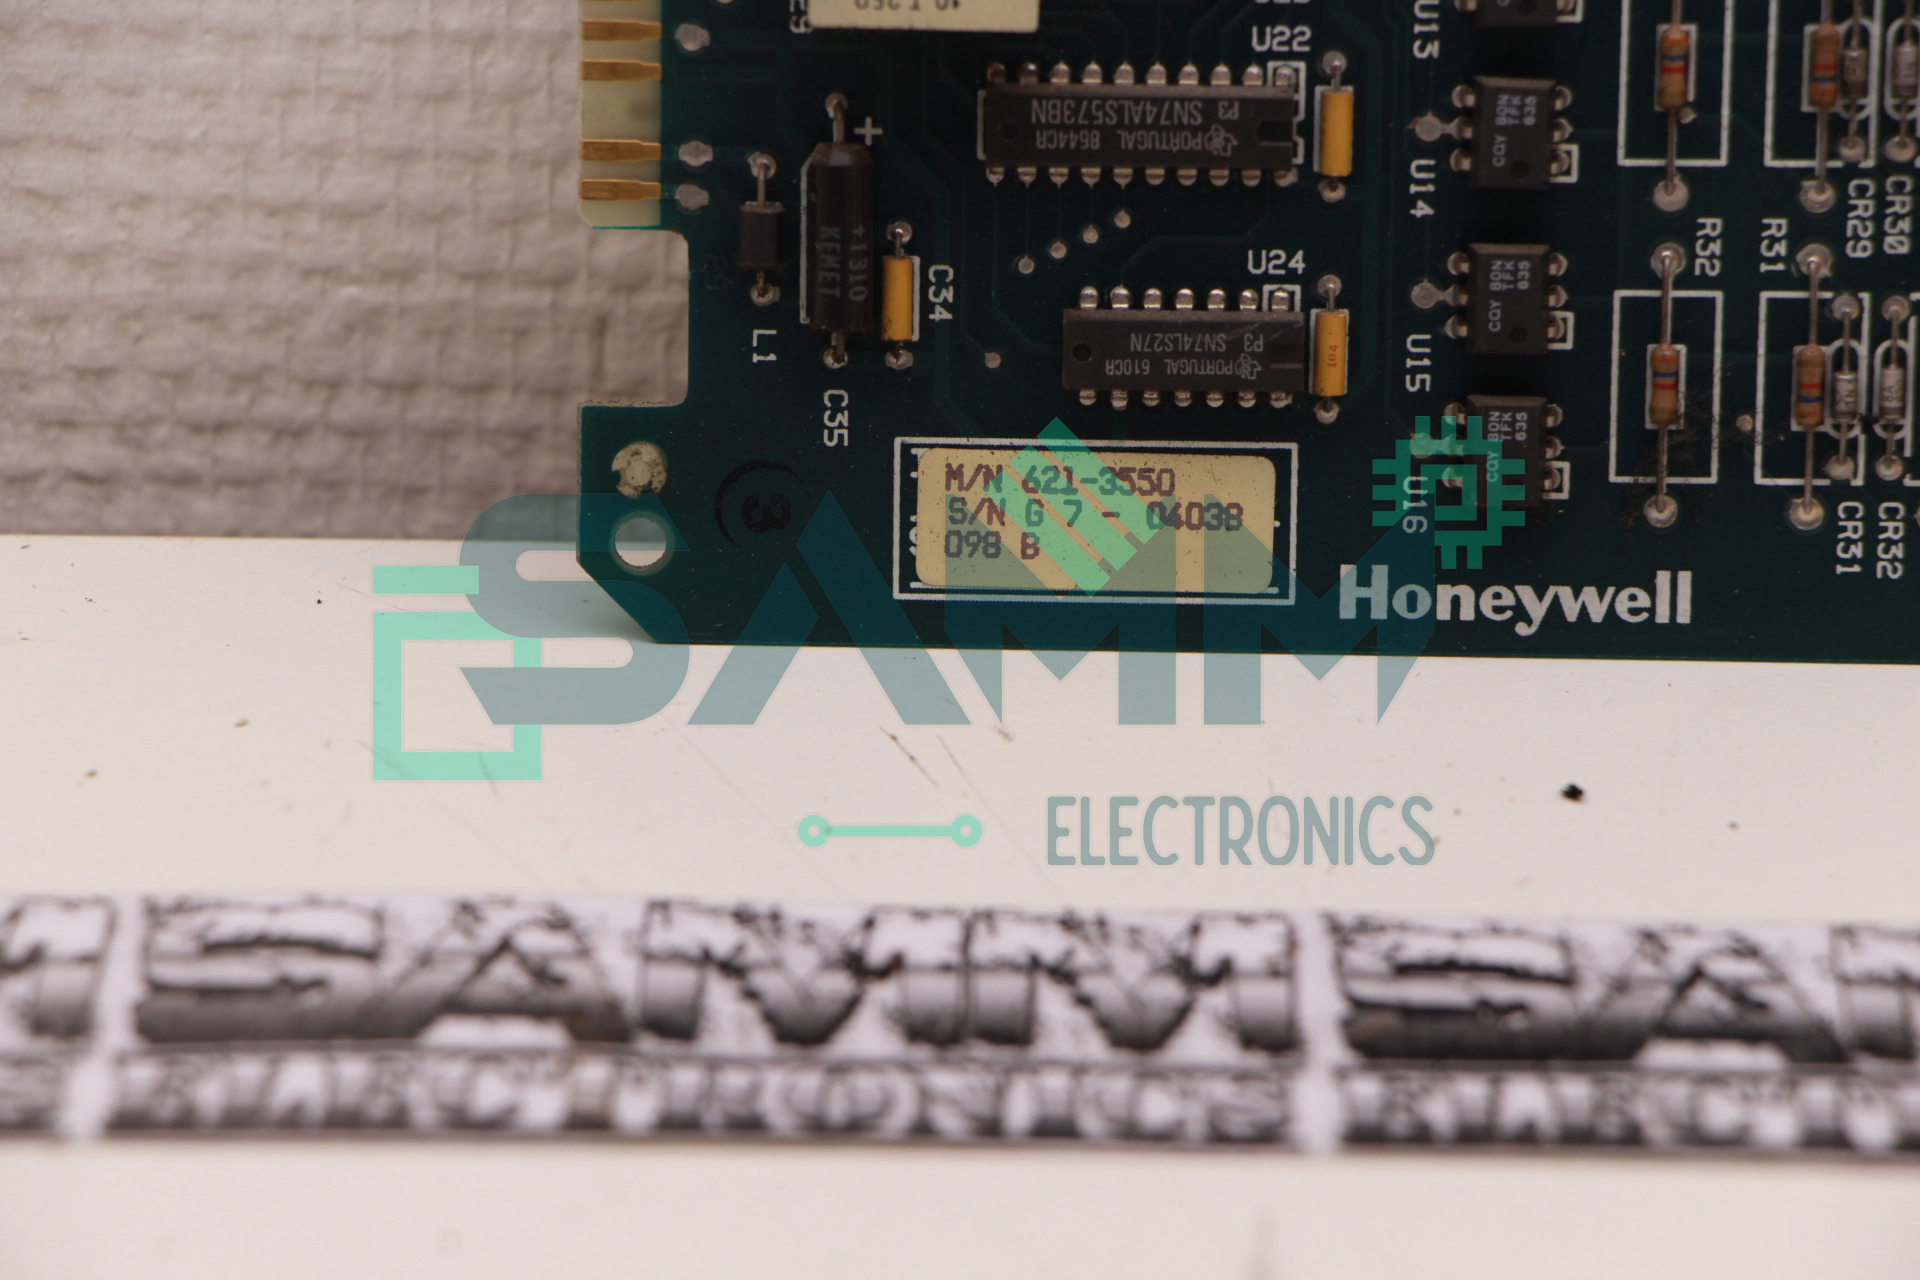 HONEYWELL-621-3550-BOARD Indexbild 4